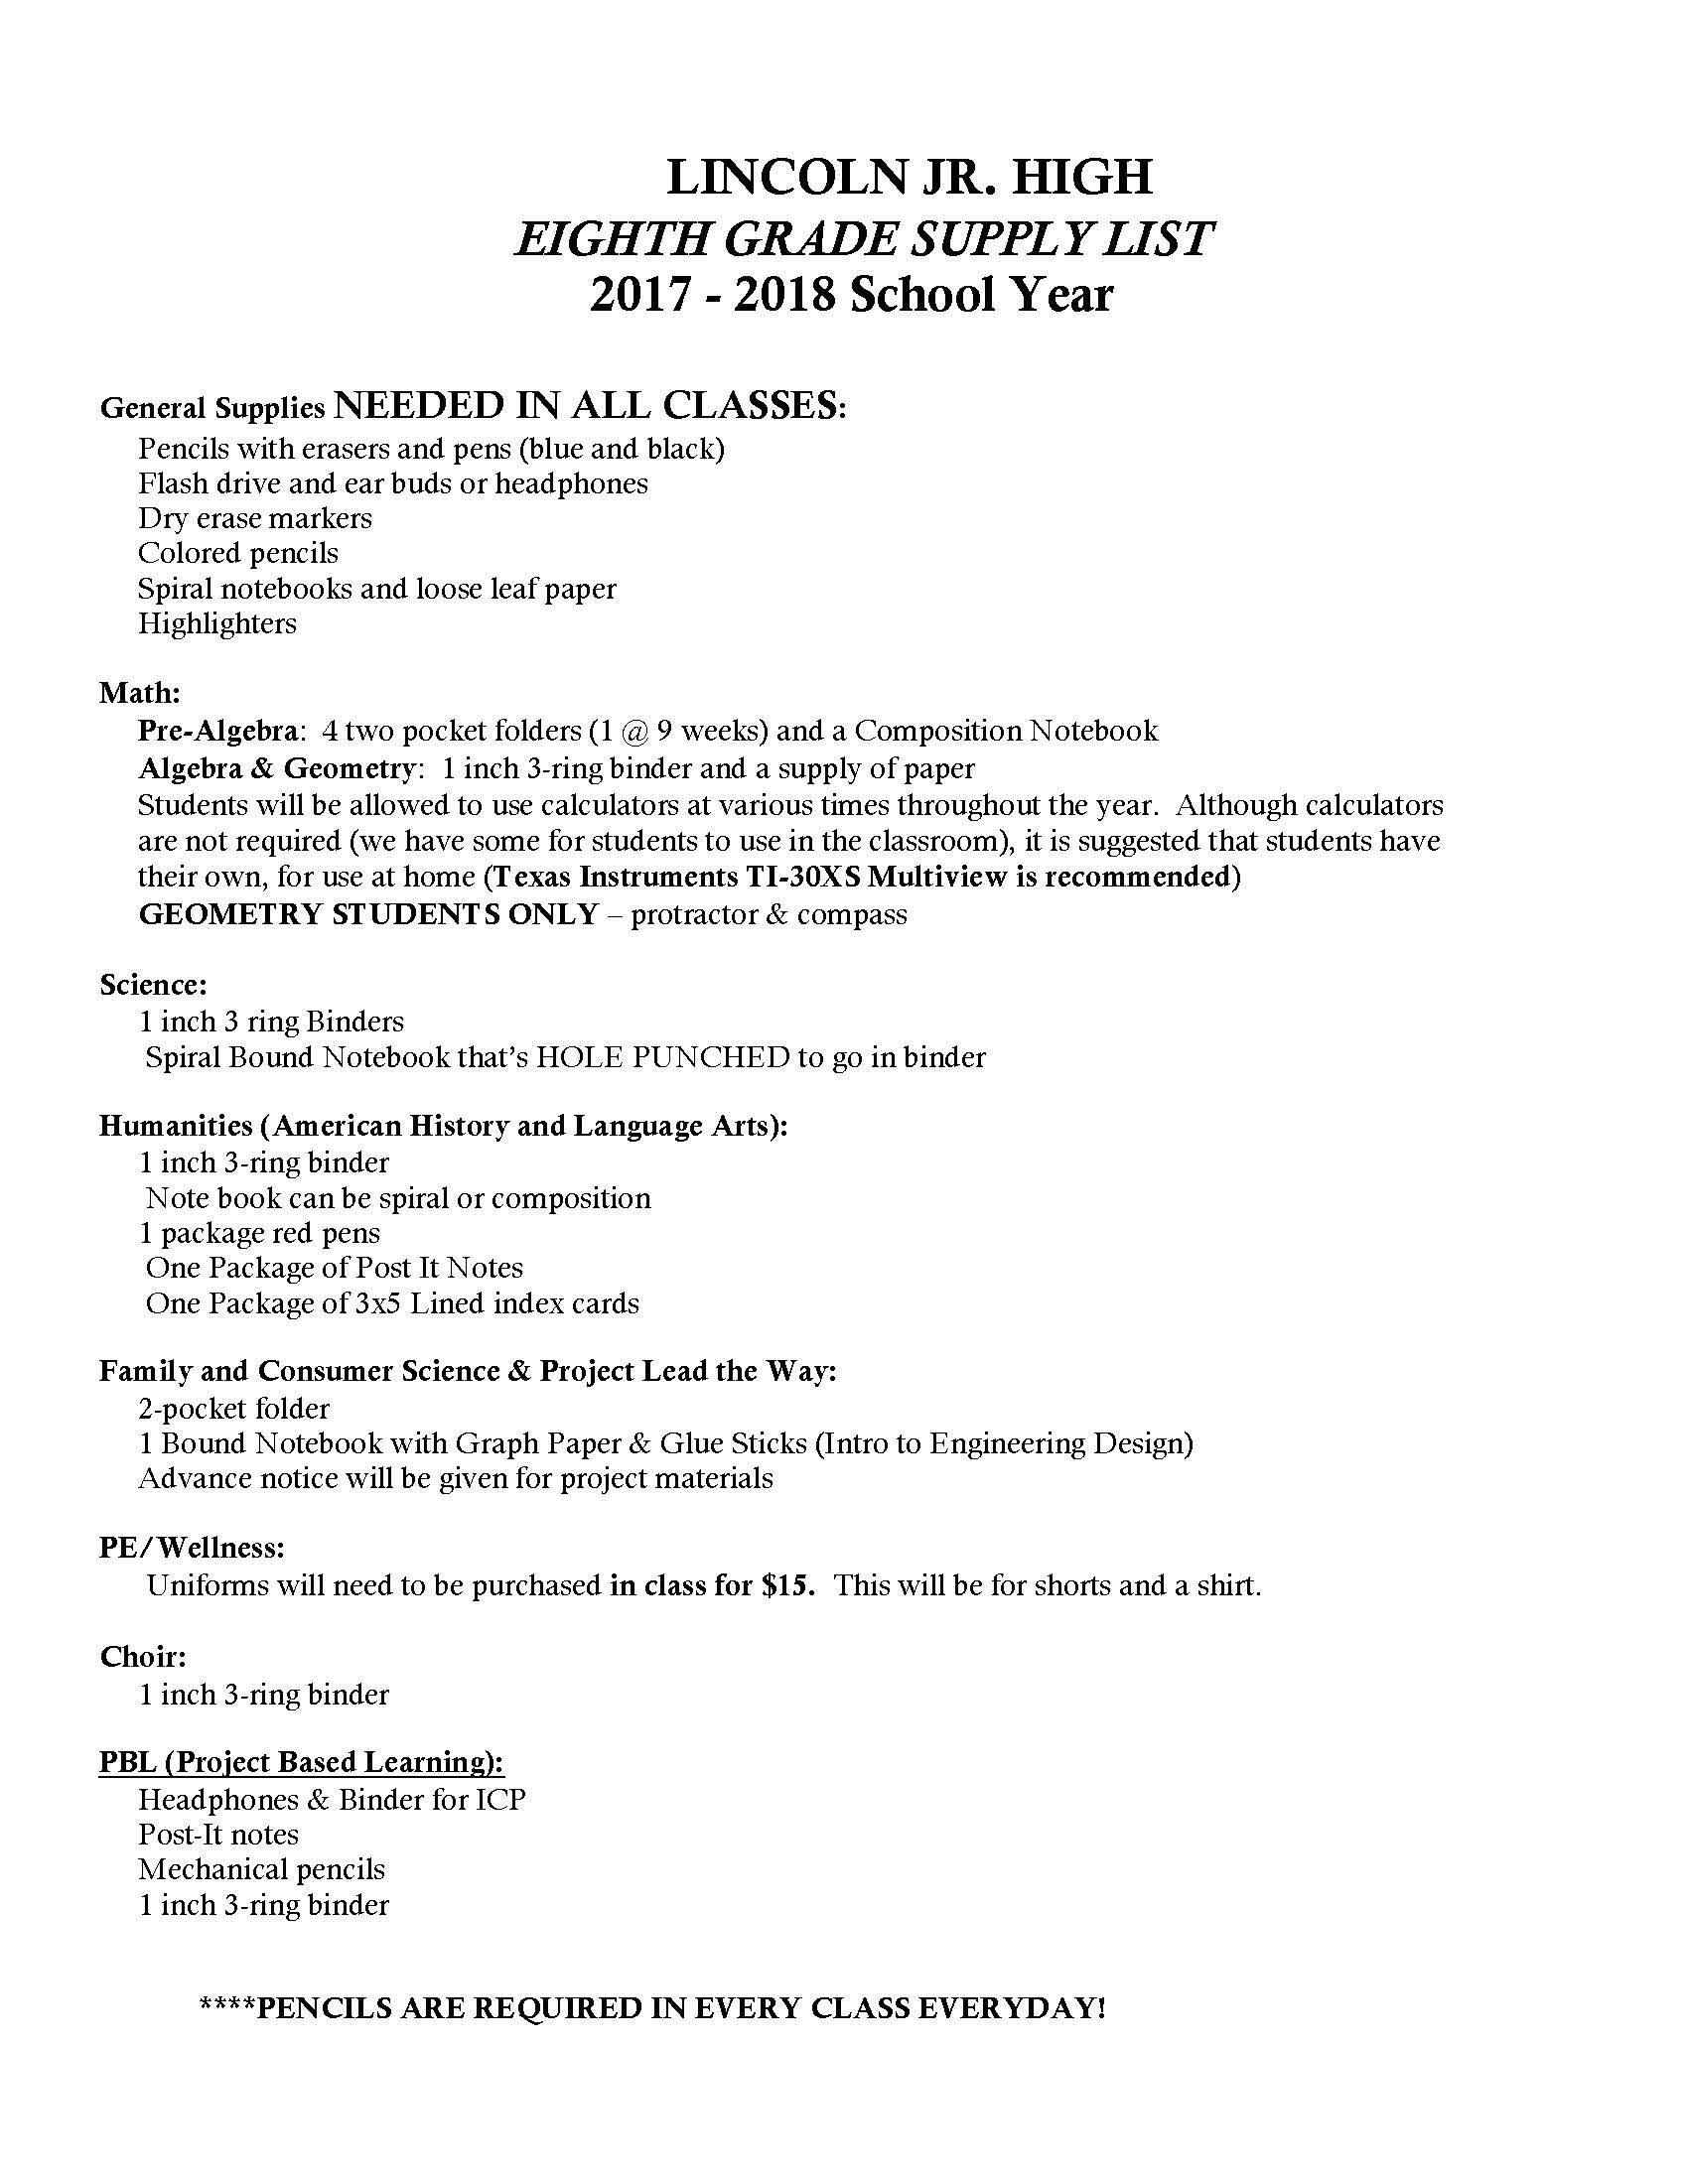 Ljh School Supply List Lincoln Jr High